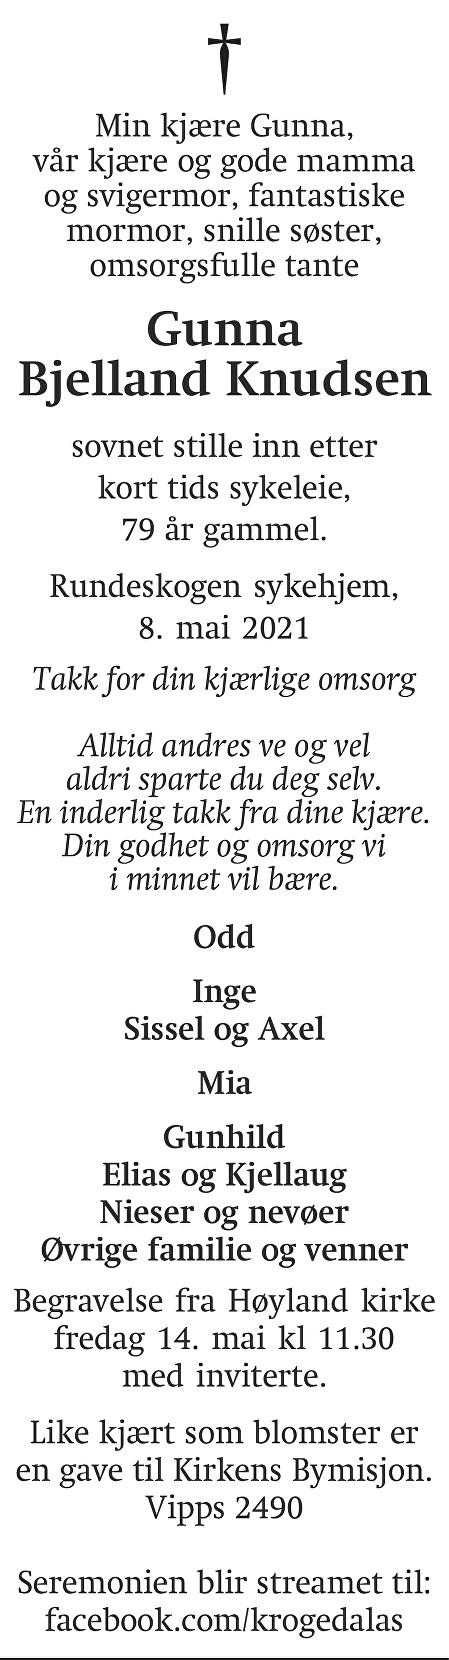 Gunna Bjelland Knudsen Dødsannonse